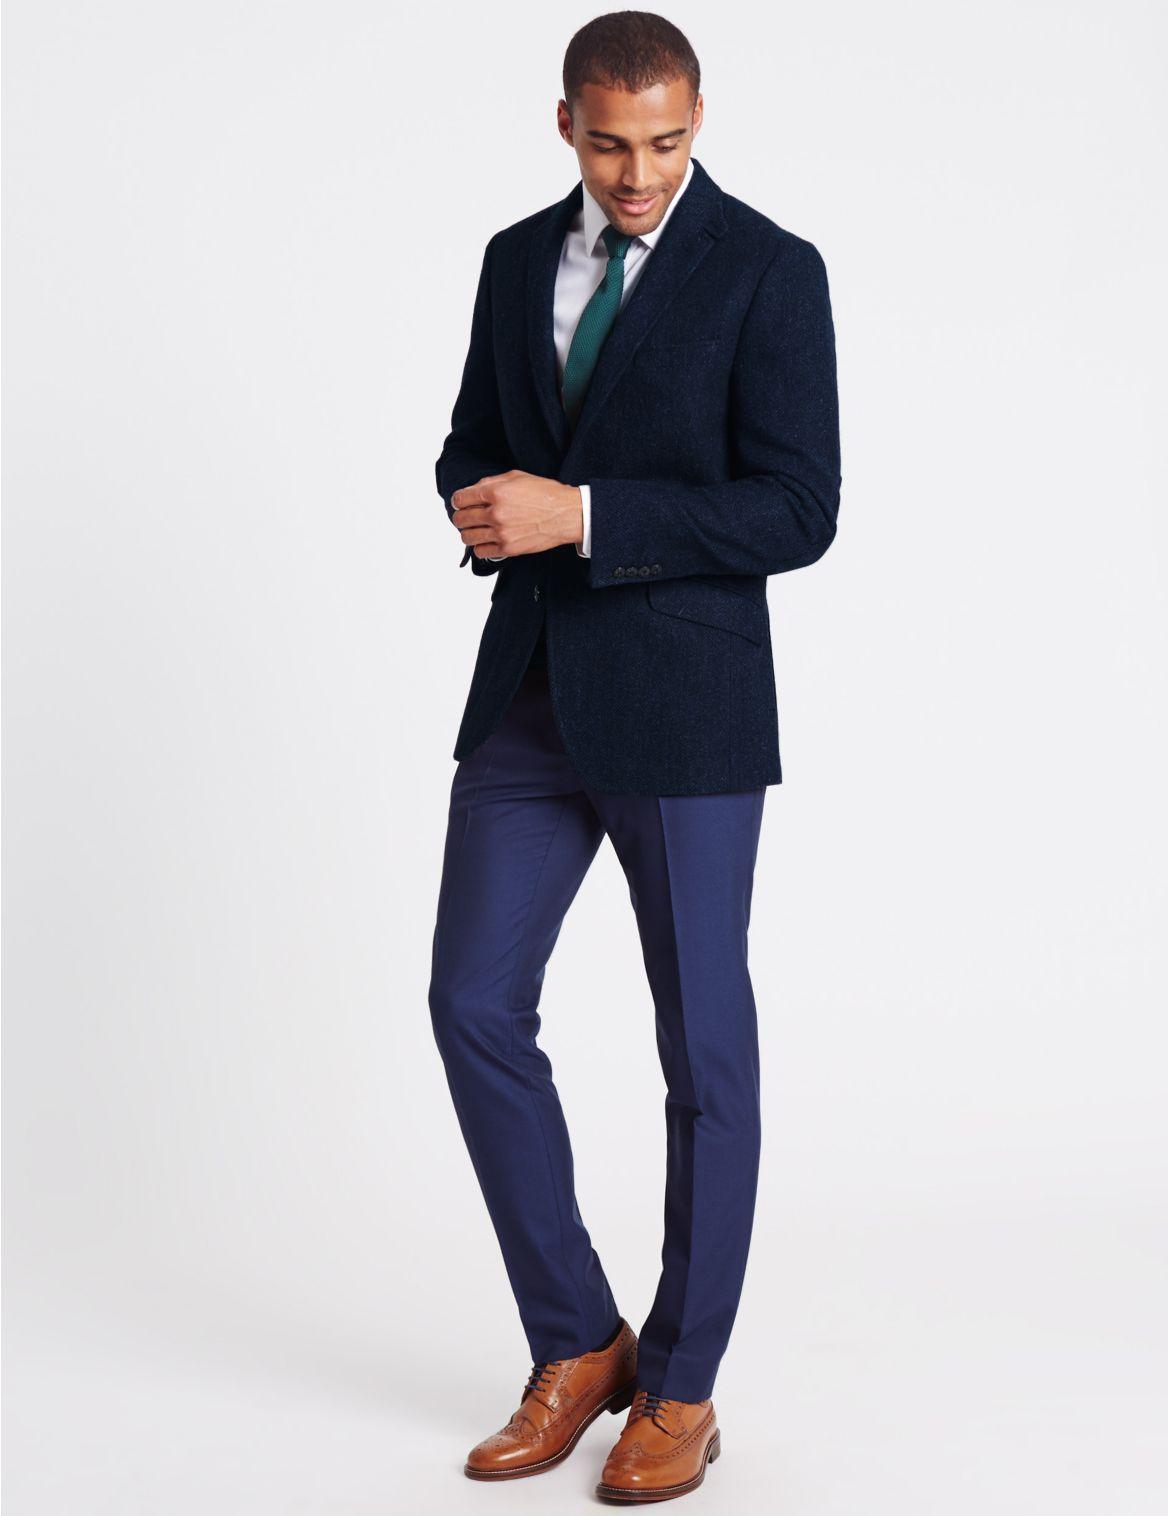 Colbert van zuiver nieuwe wol met